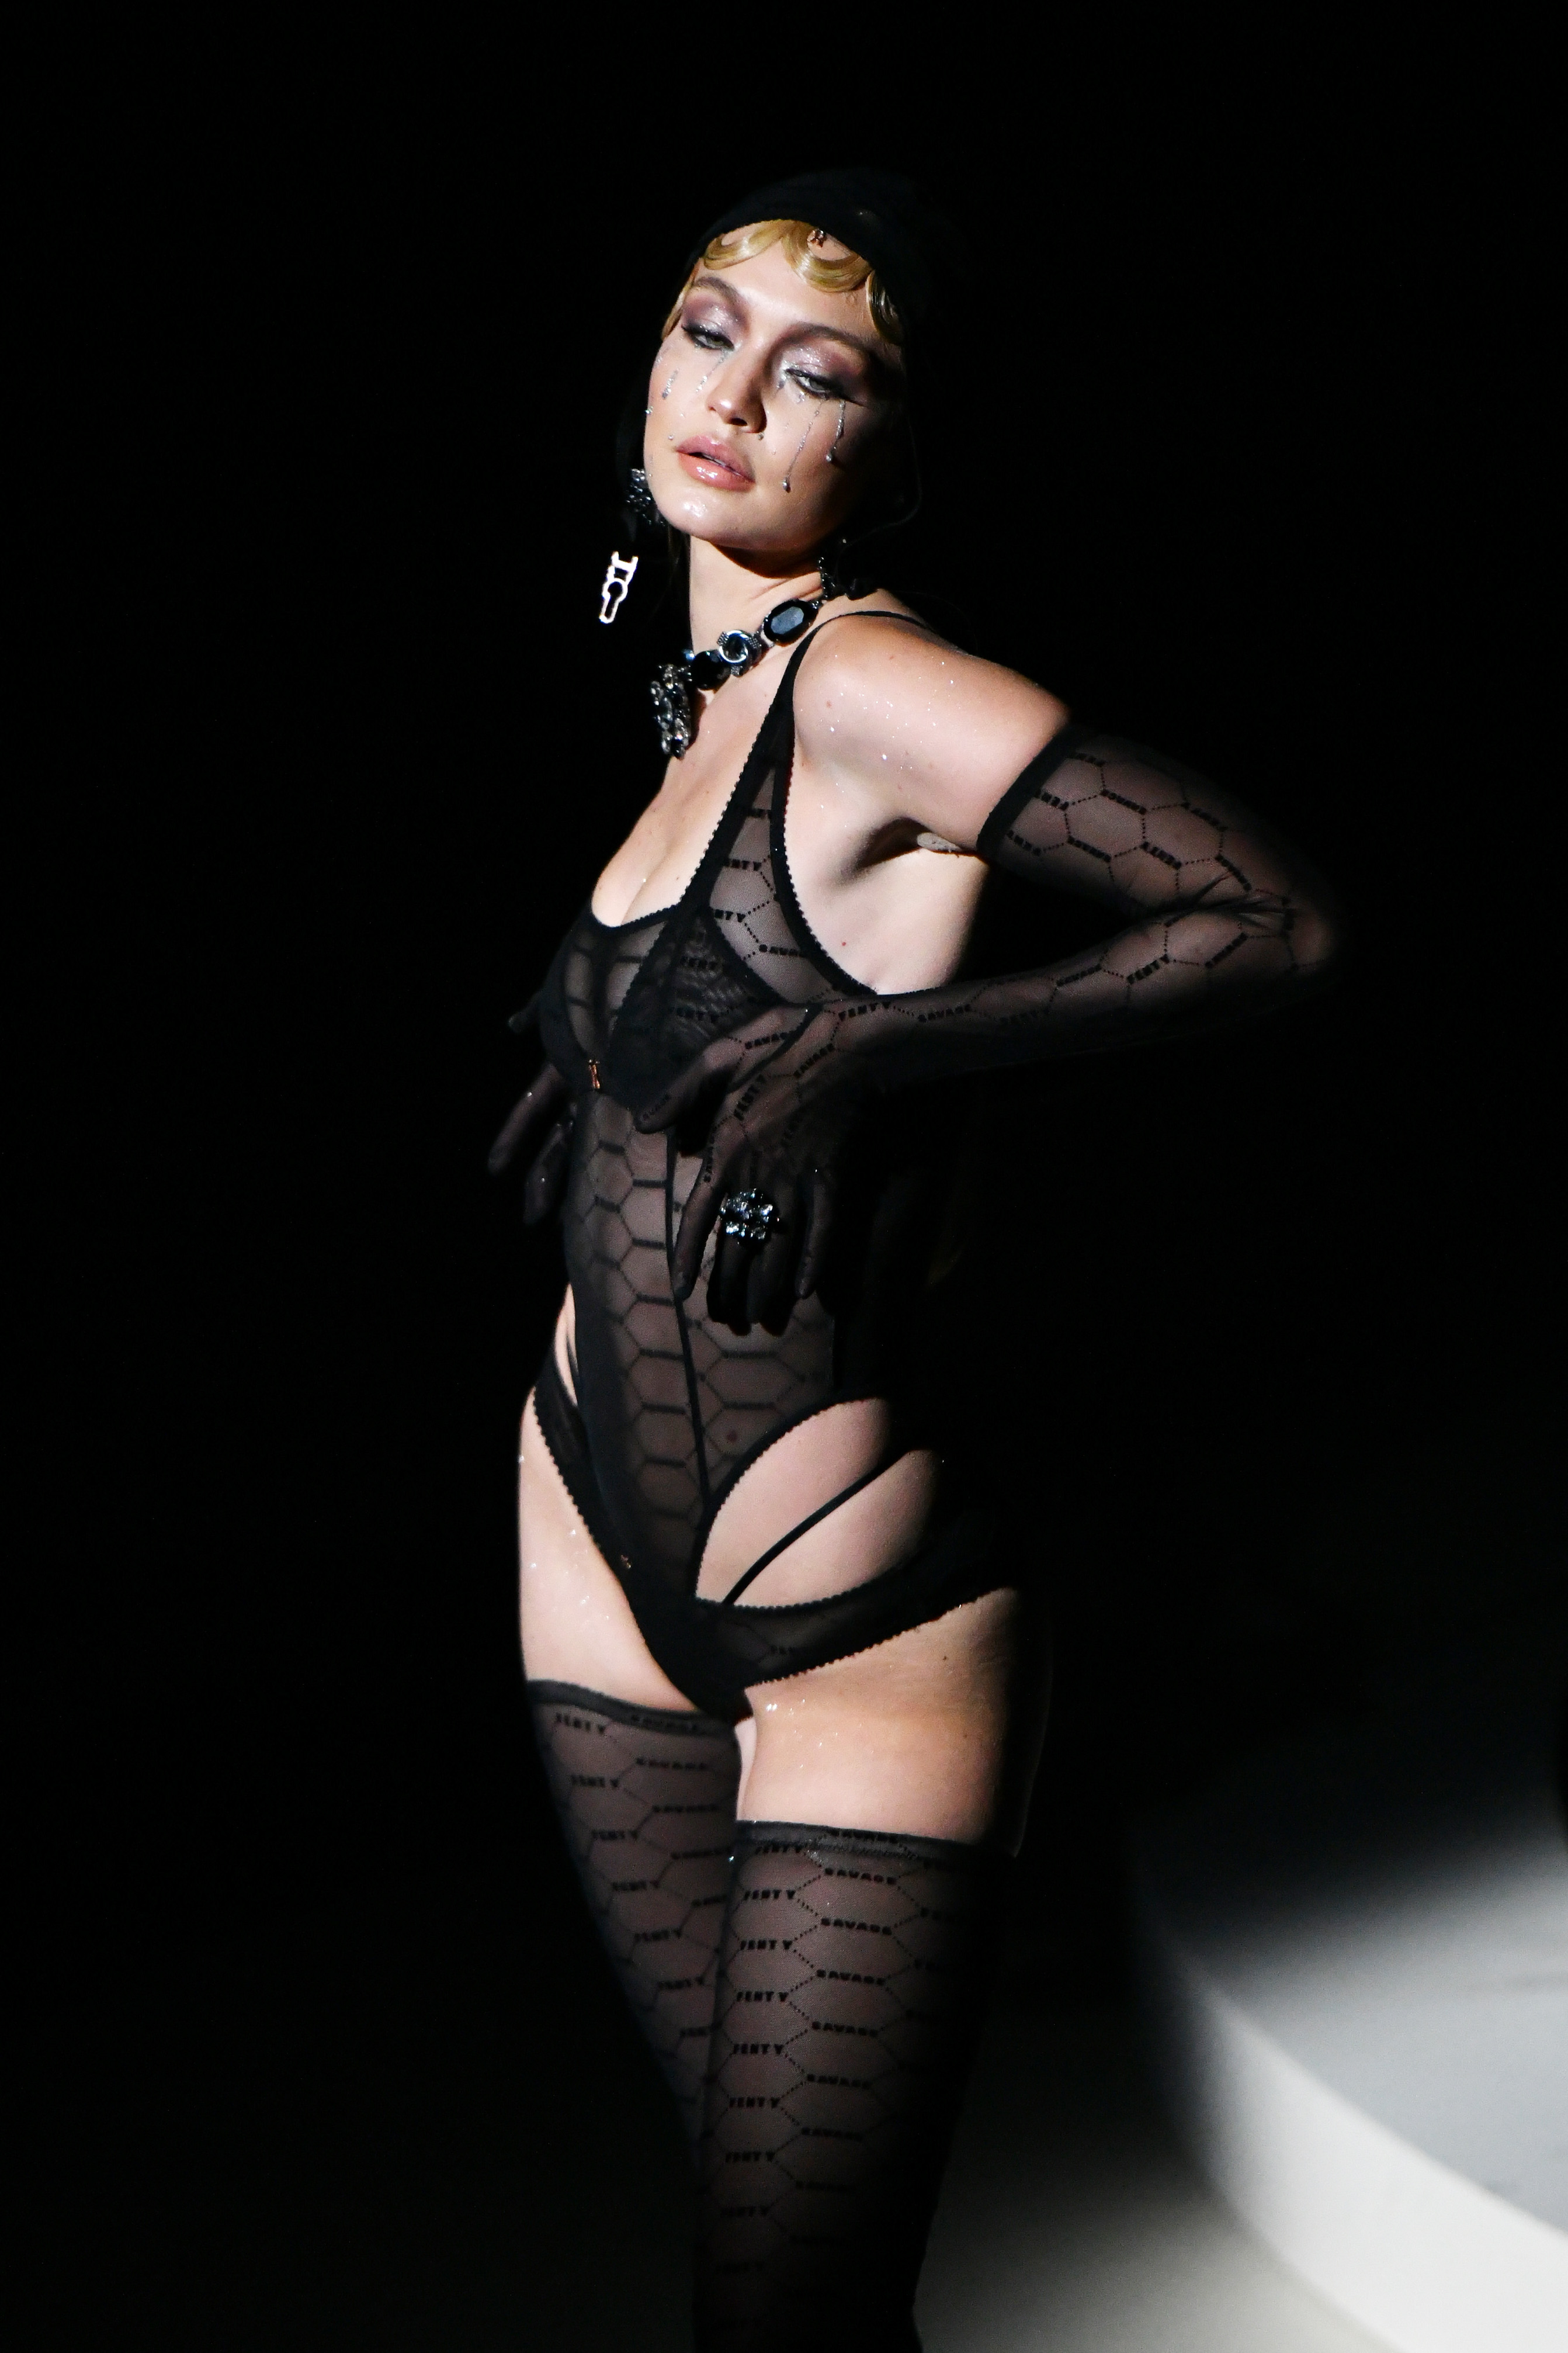 Gigi Hadid modelling one of the make-up looks